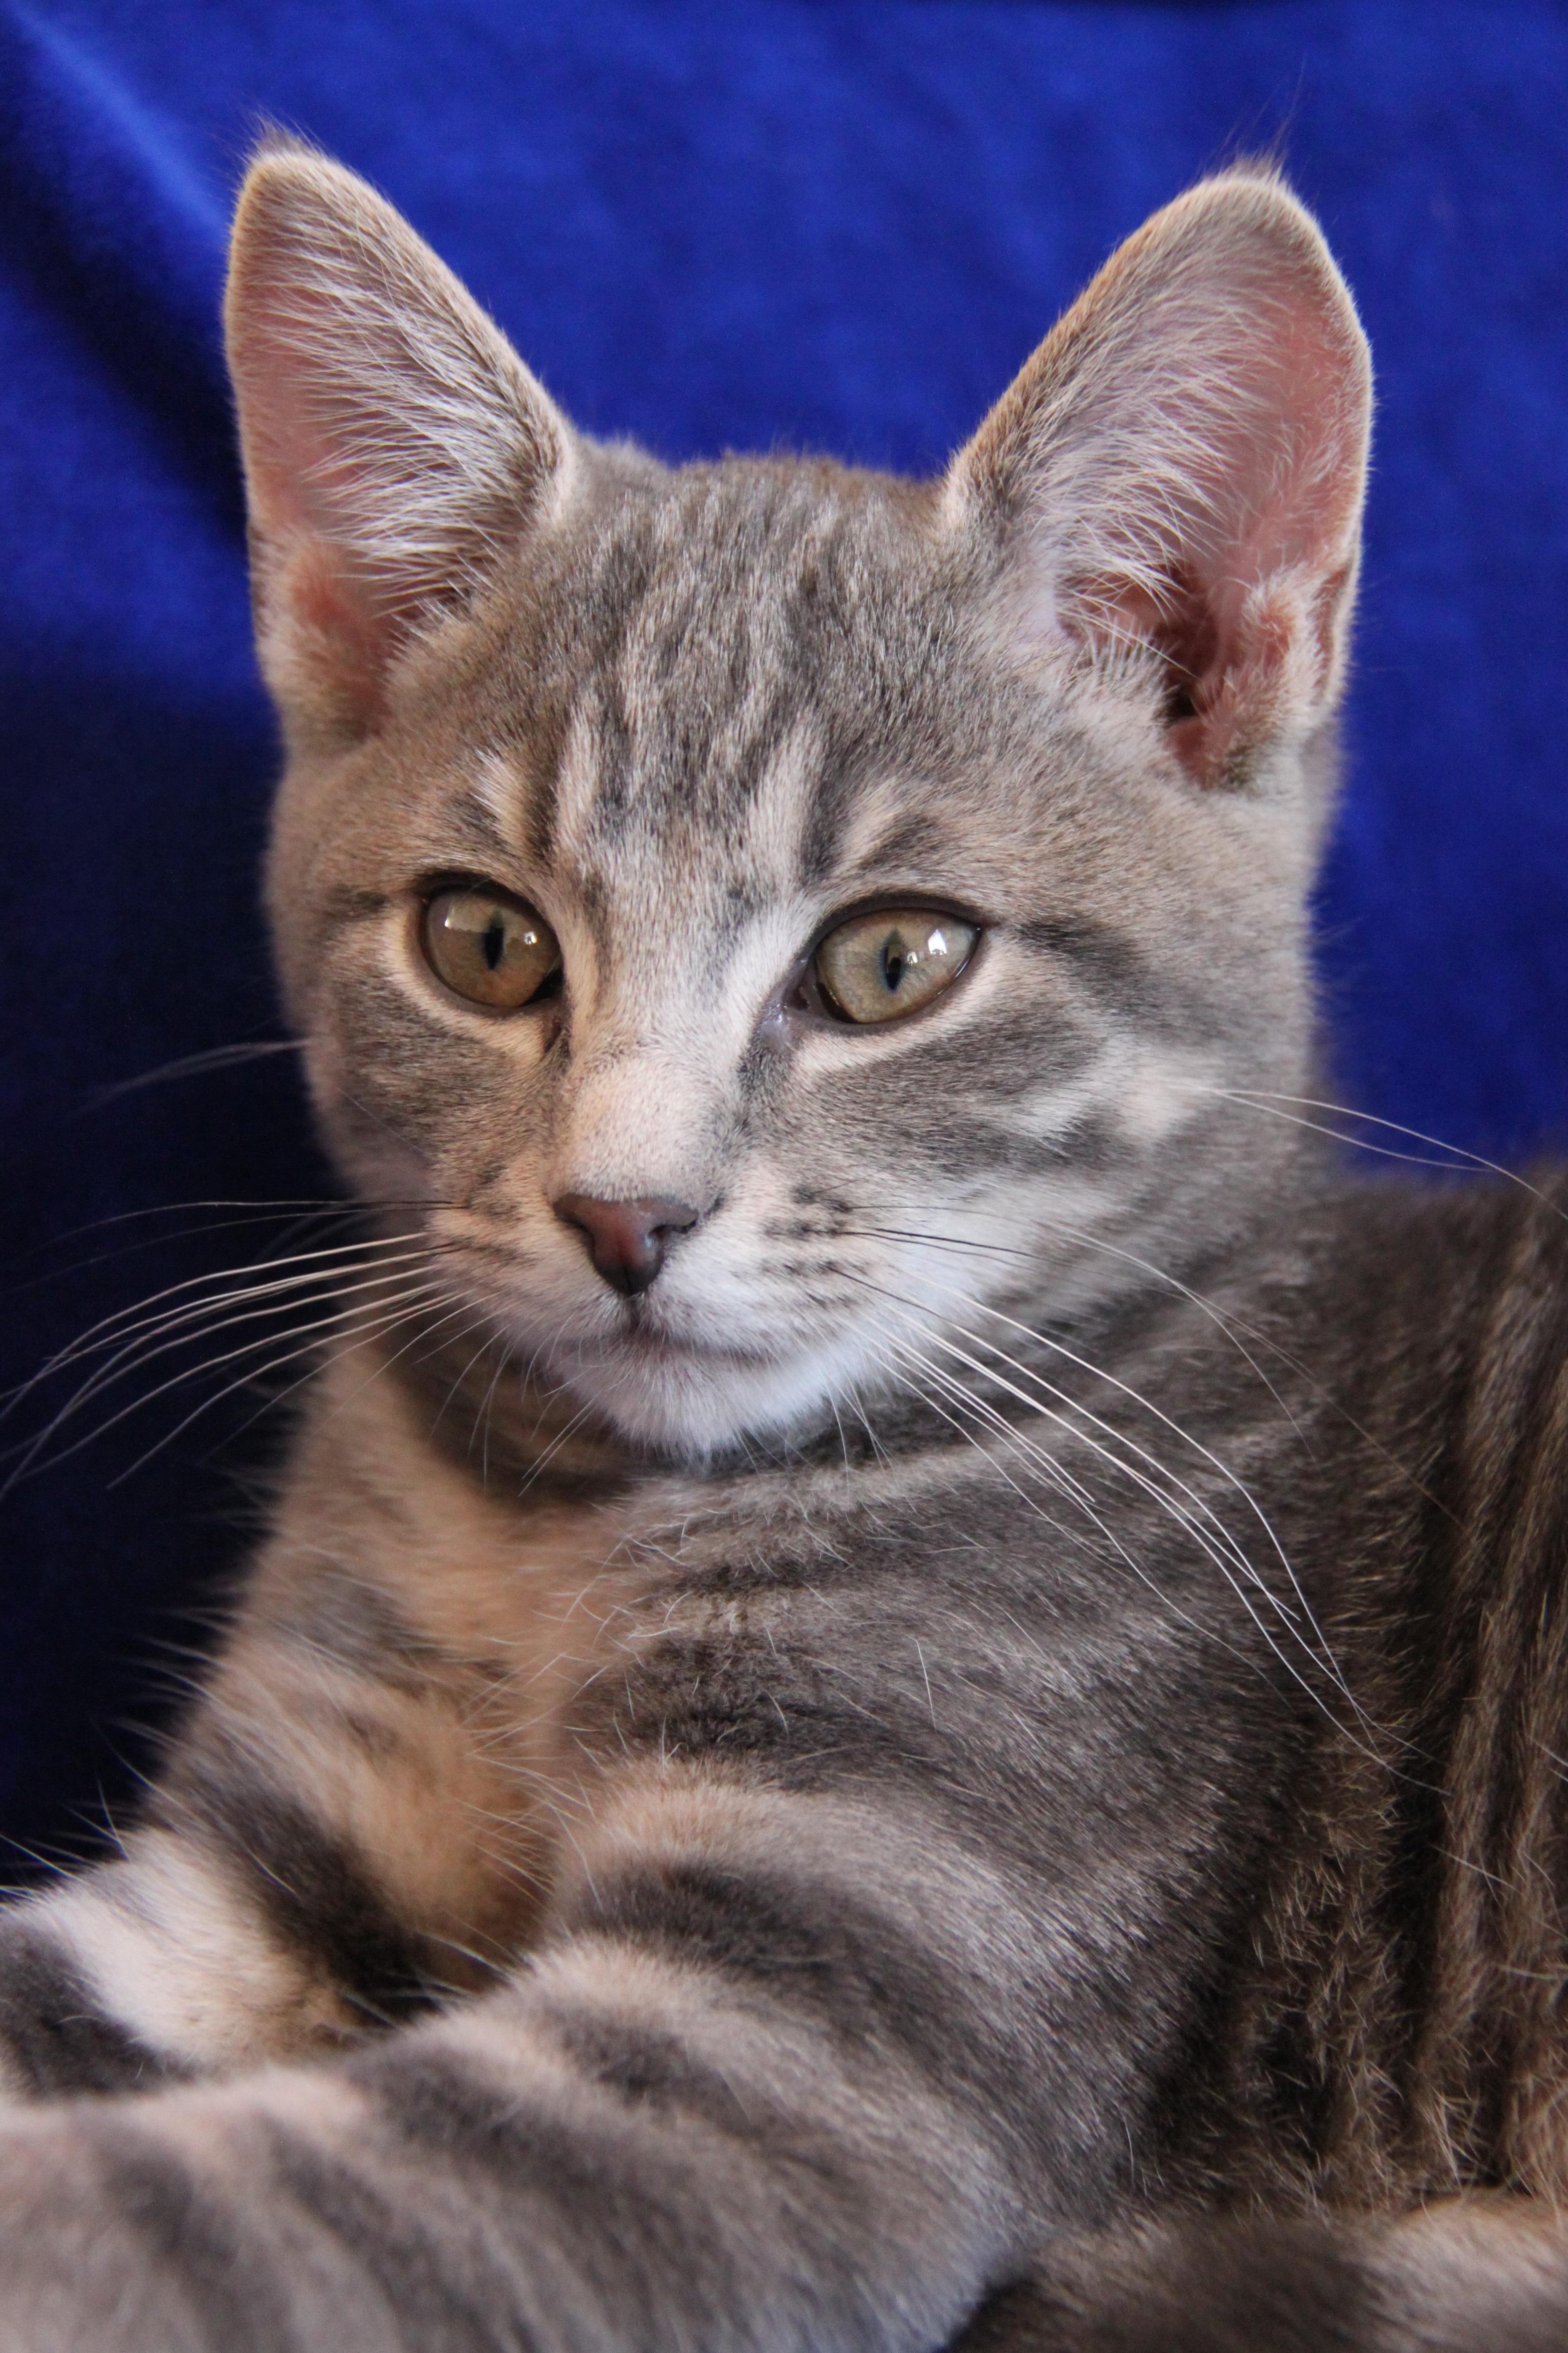 580 Koleksi Gambar Binatang Kucing Lucu HD Terbaru